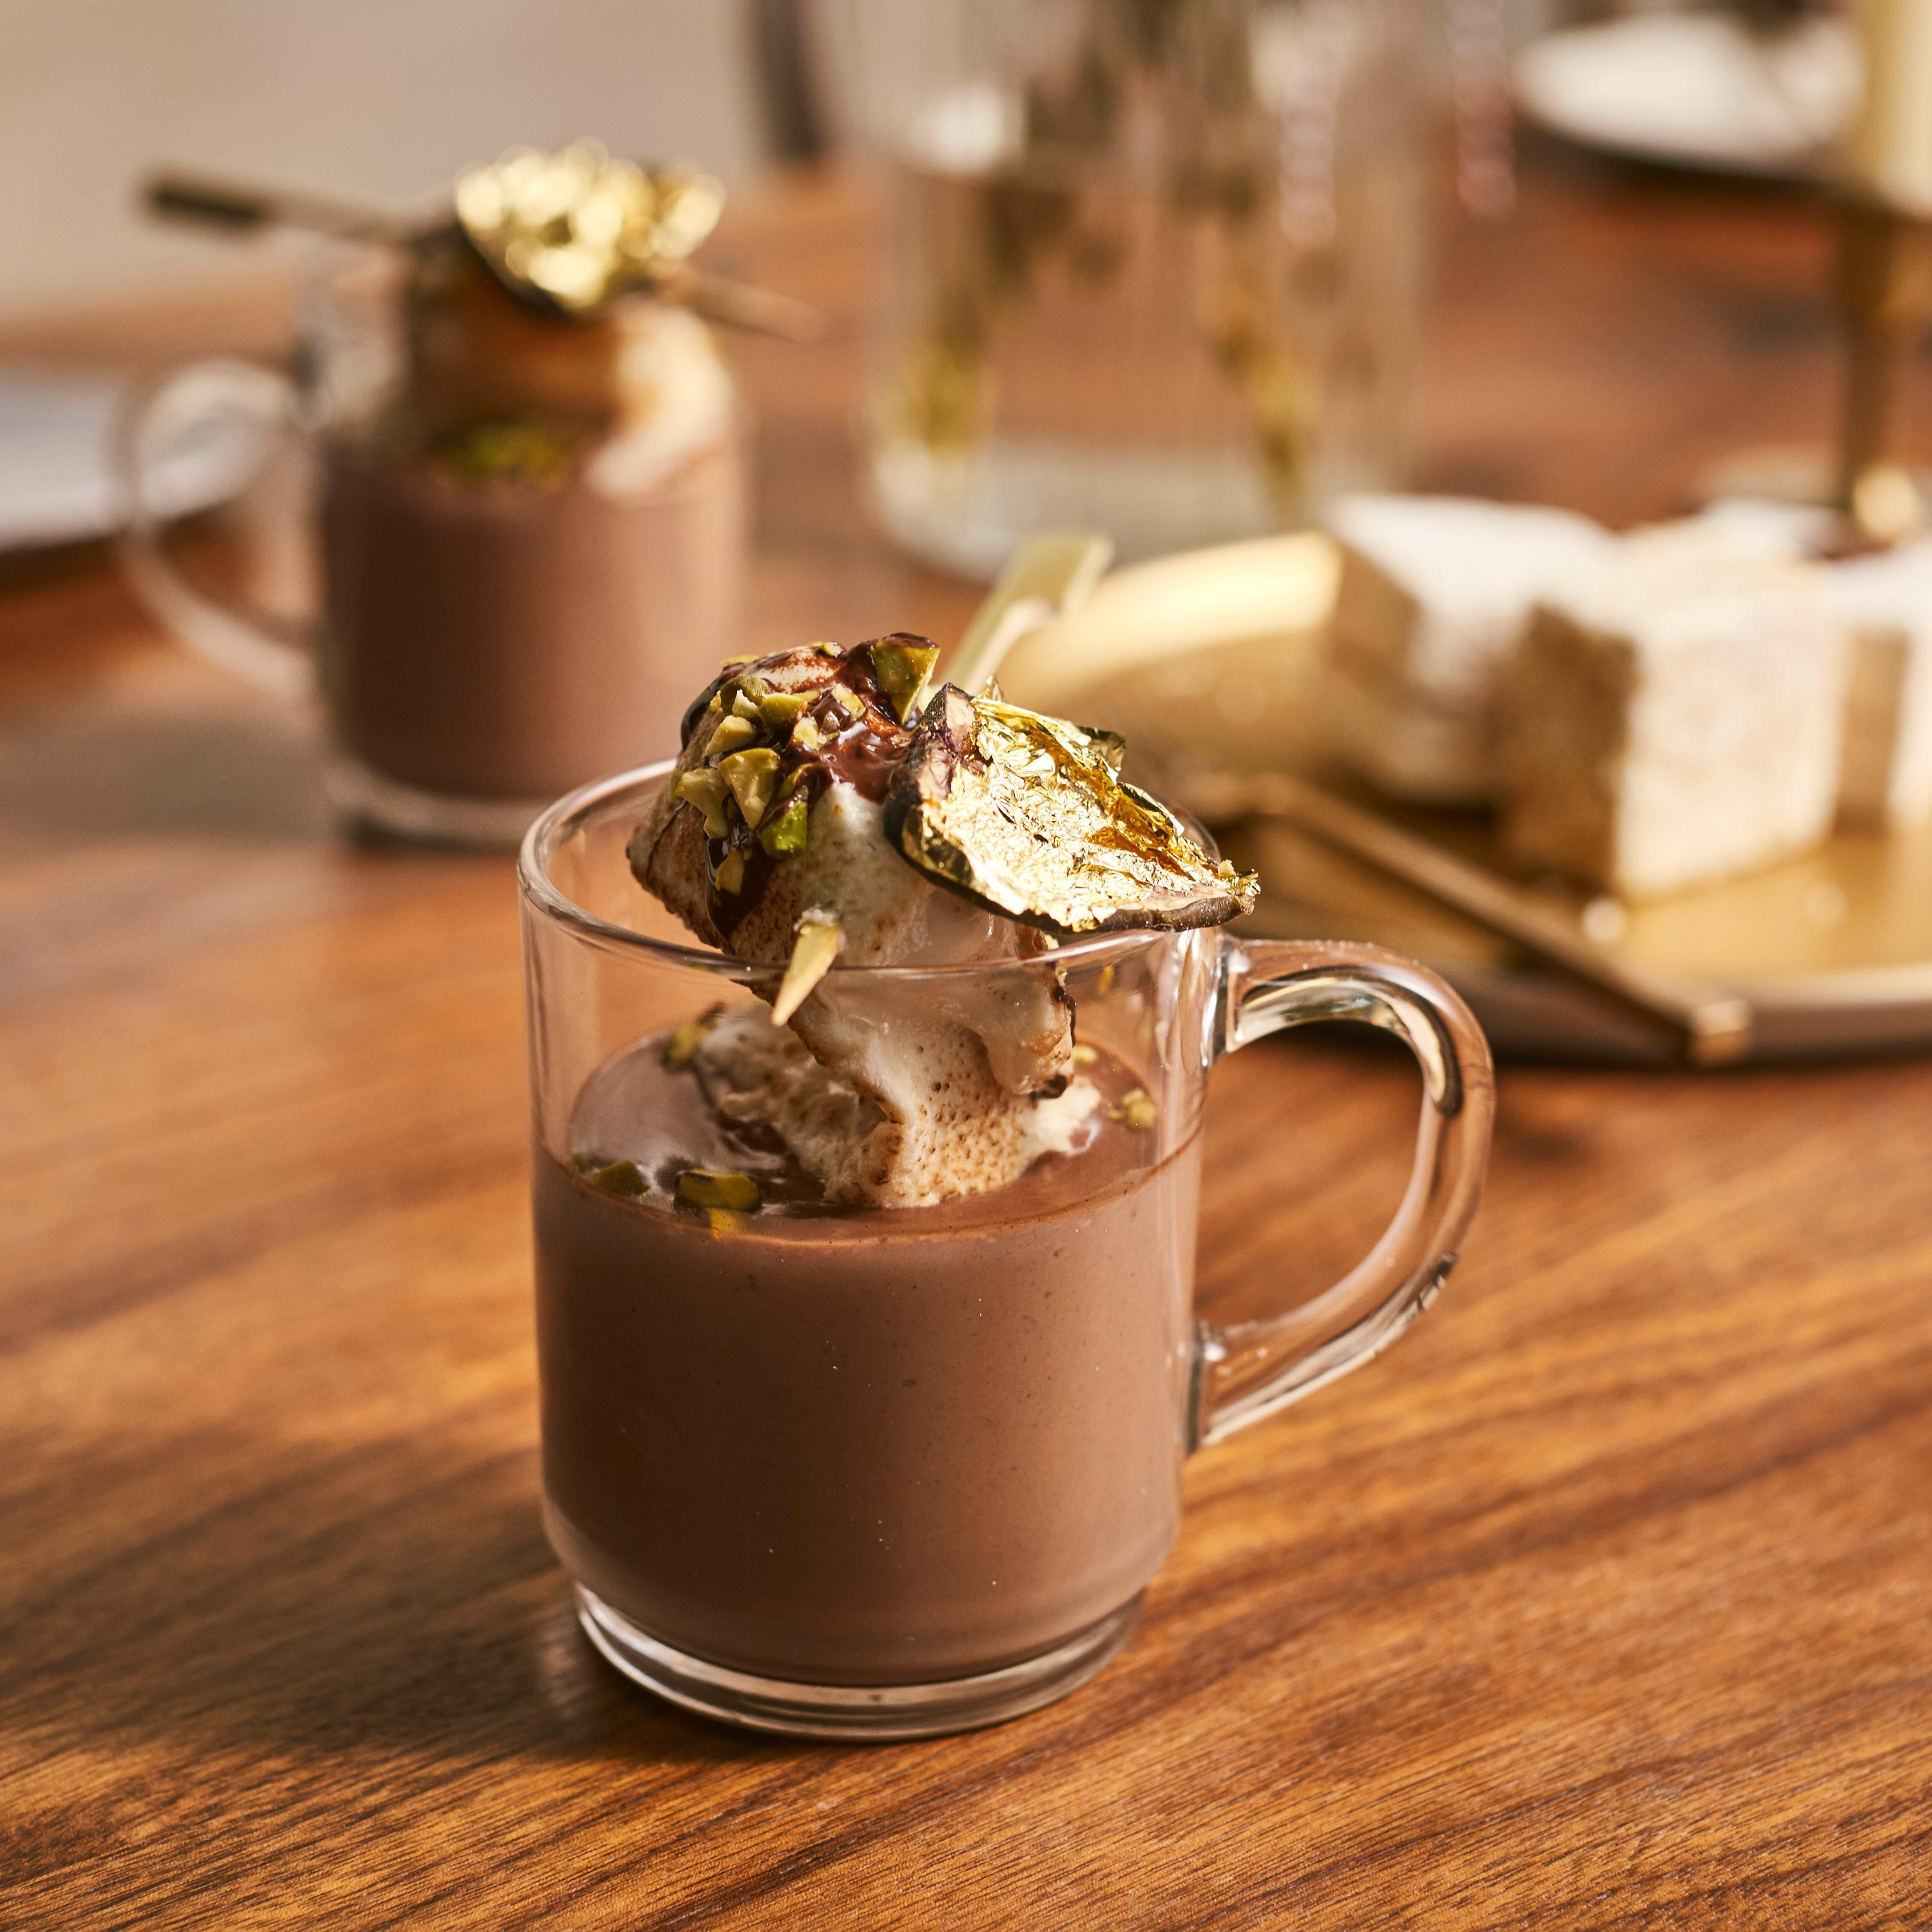 The Marshmallowist's Indulgent Baileys Hot Chocolate